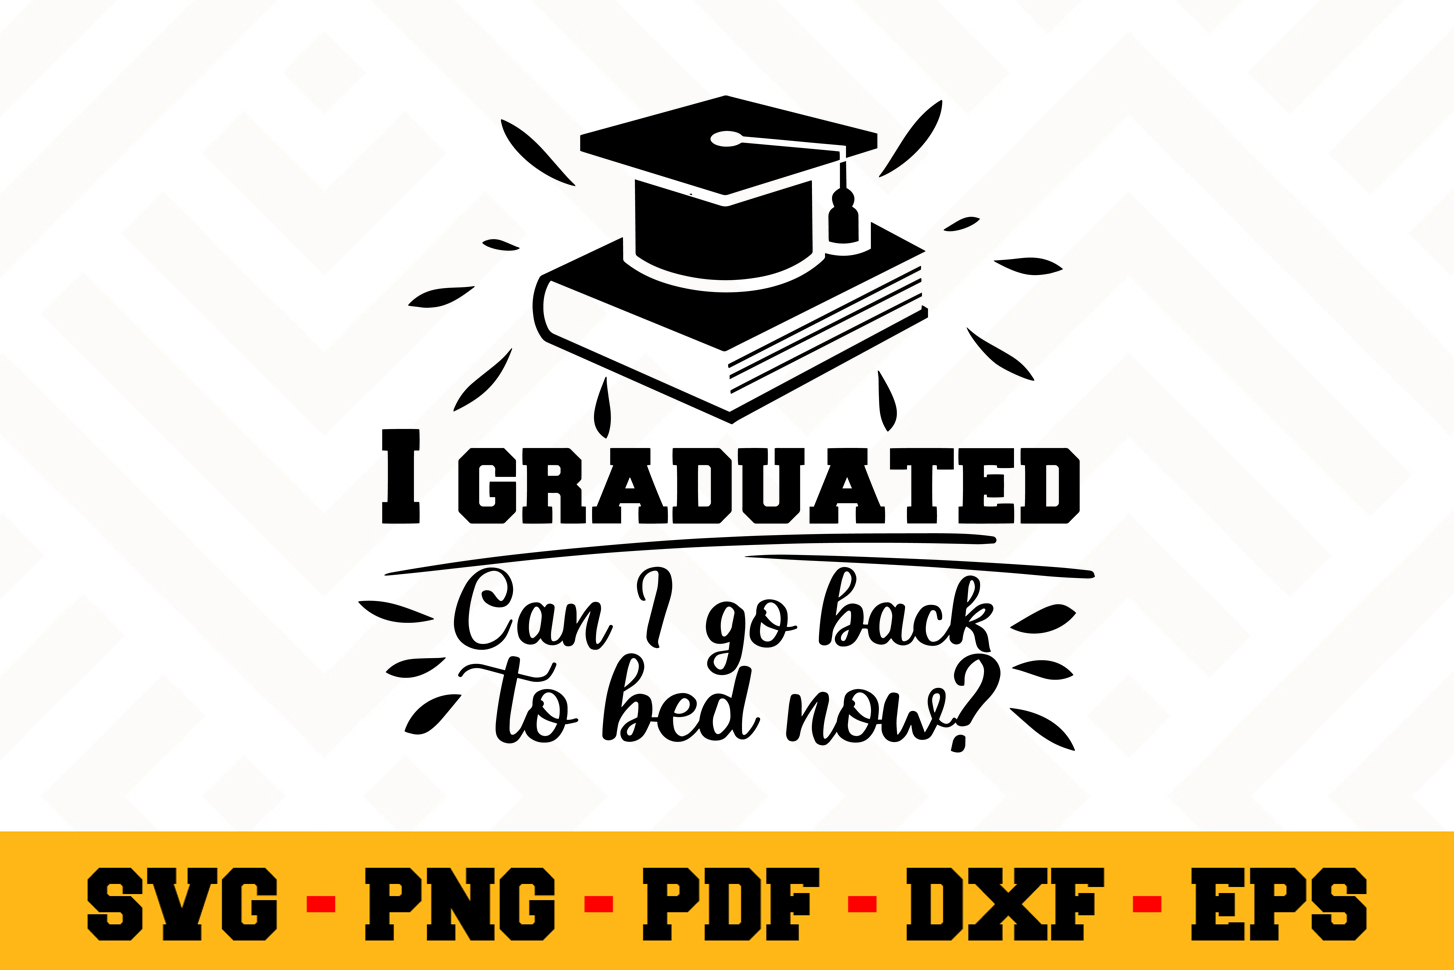 Graduation SVG Design n588 | Graduation SVG Cut File example image 1